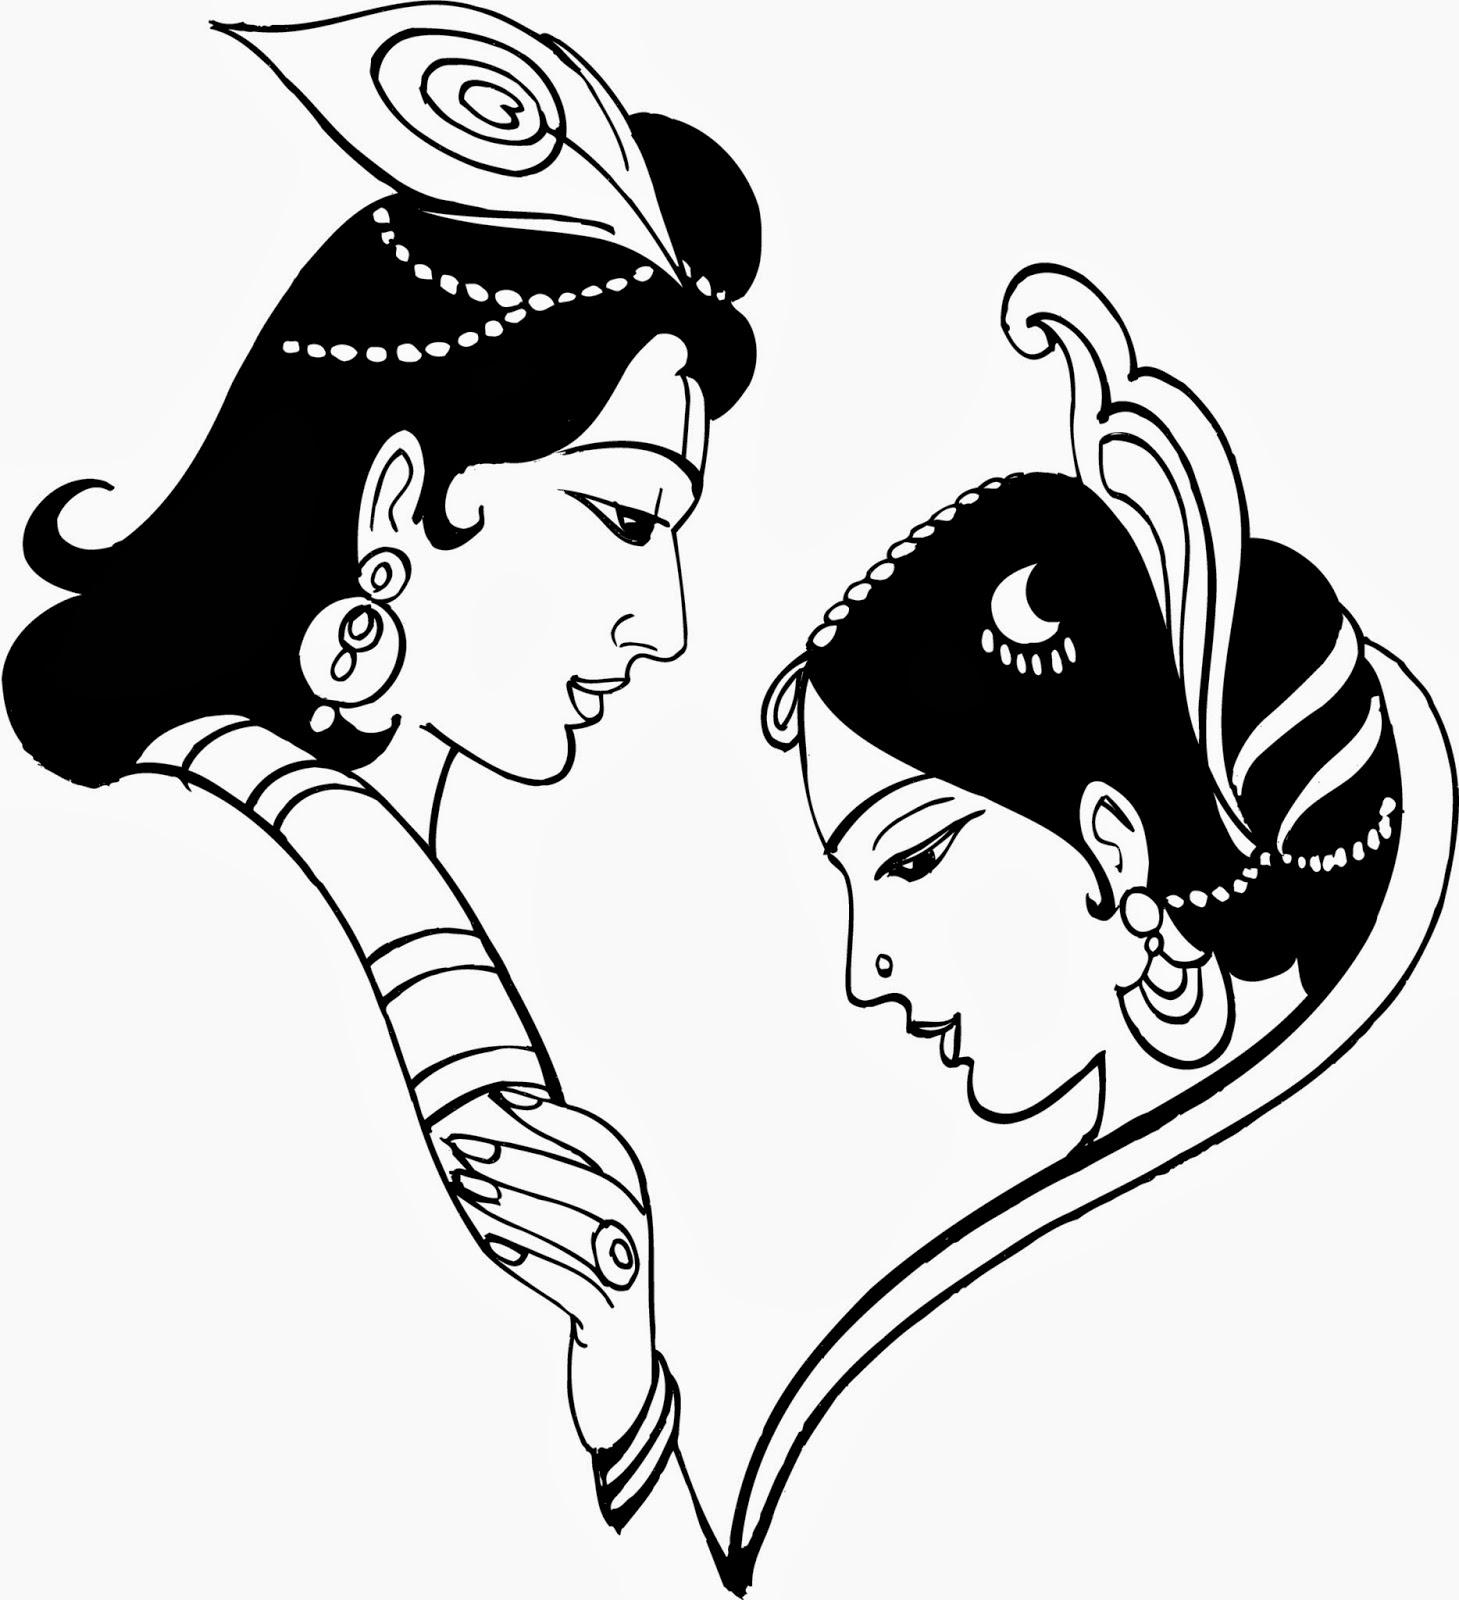 hindu wedding clipart free black and white - photo #11